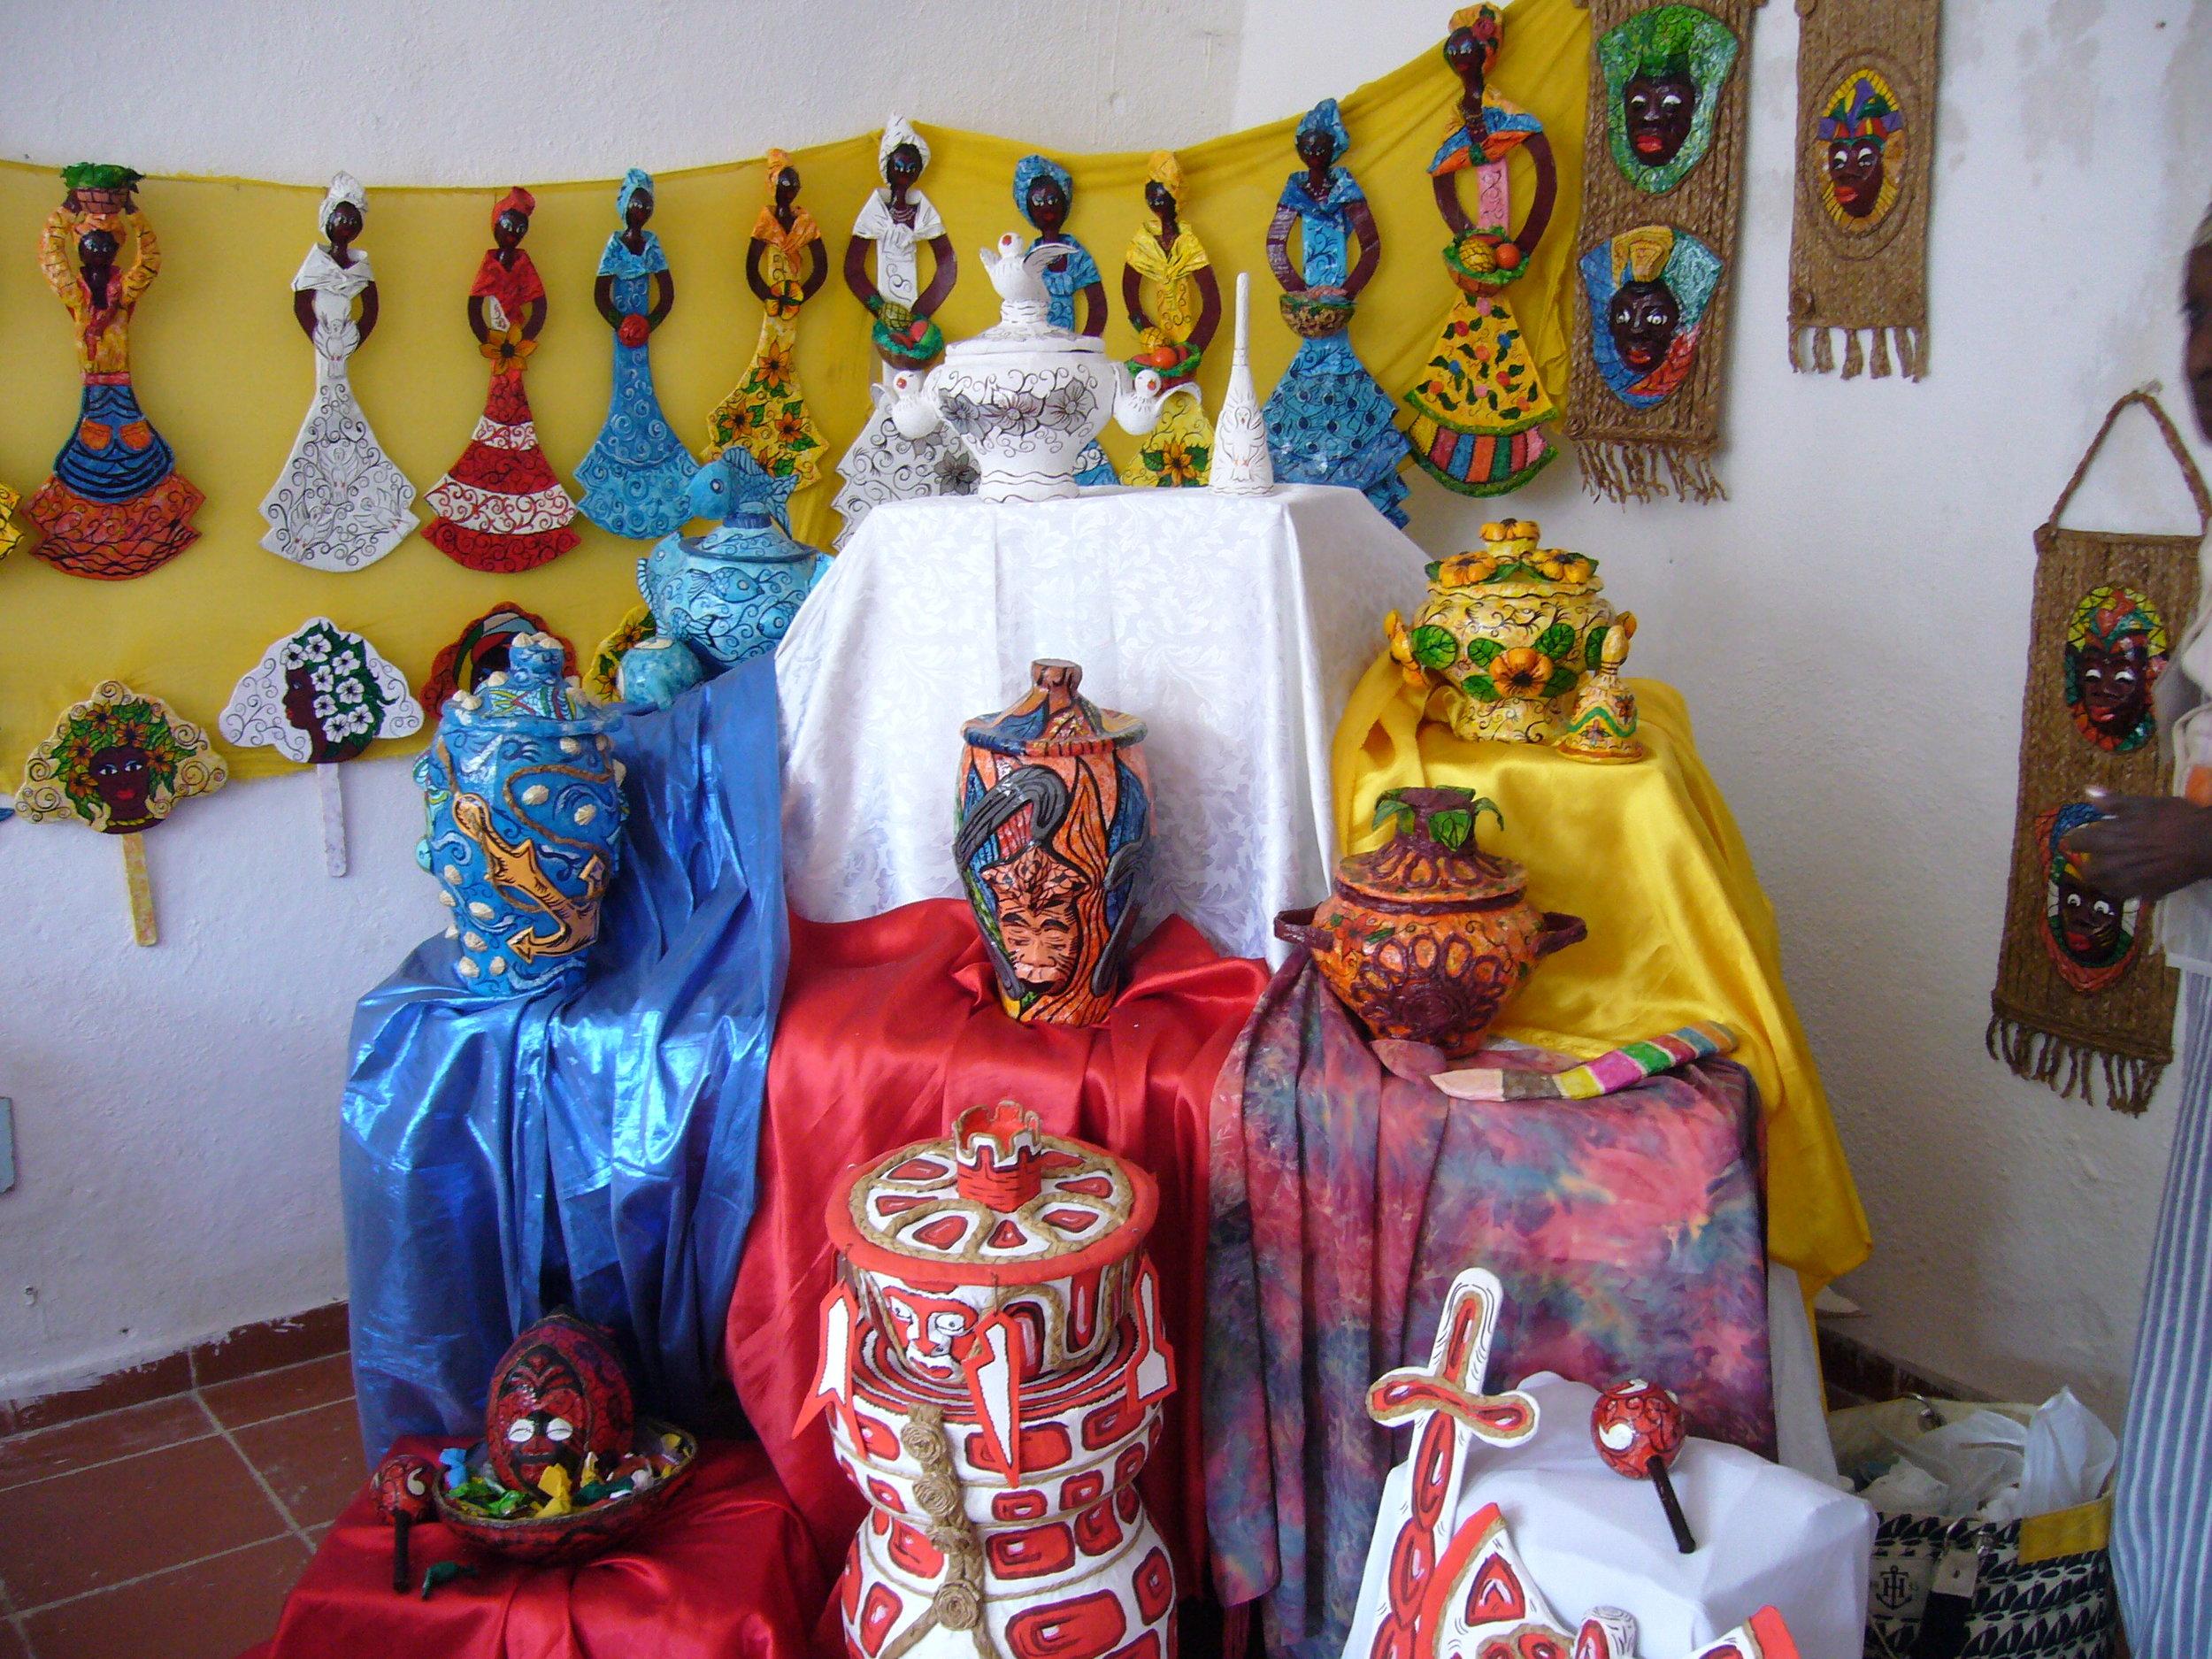 Tour of La Muñeca Negra Proyecto (